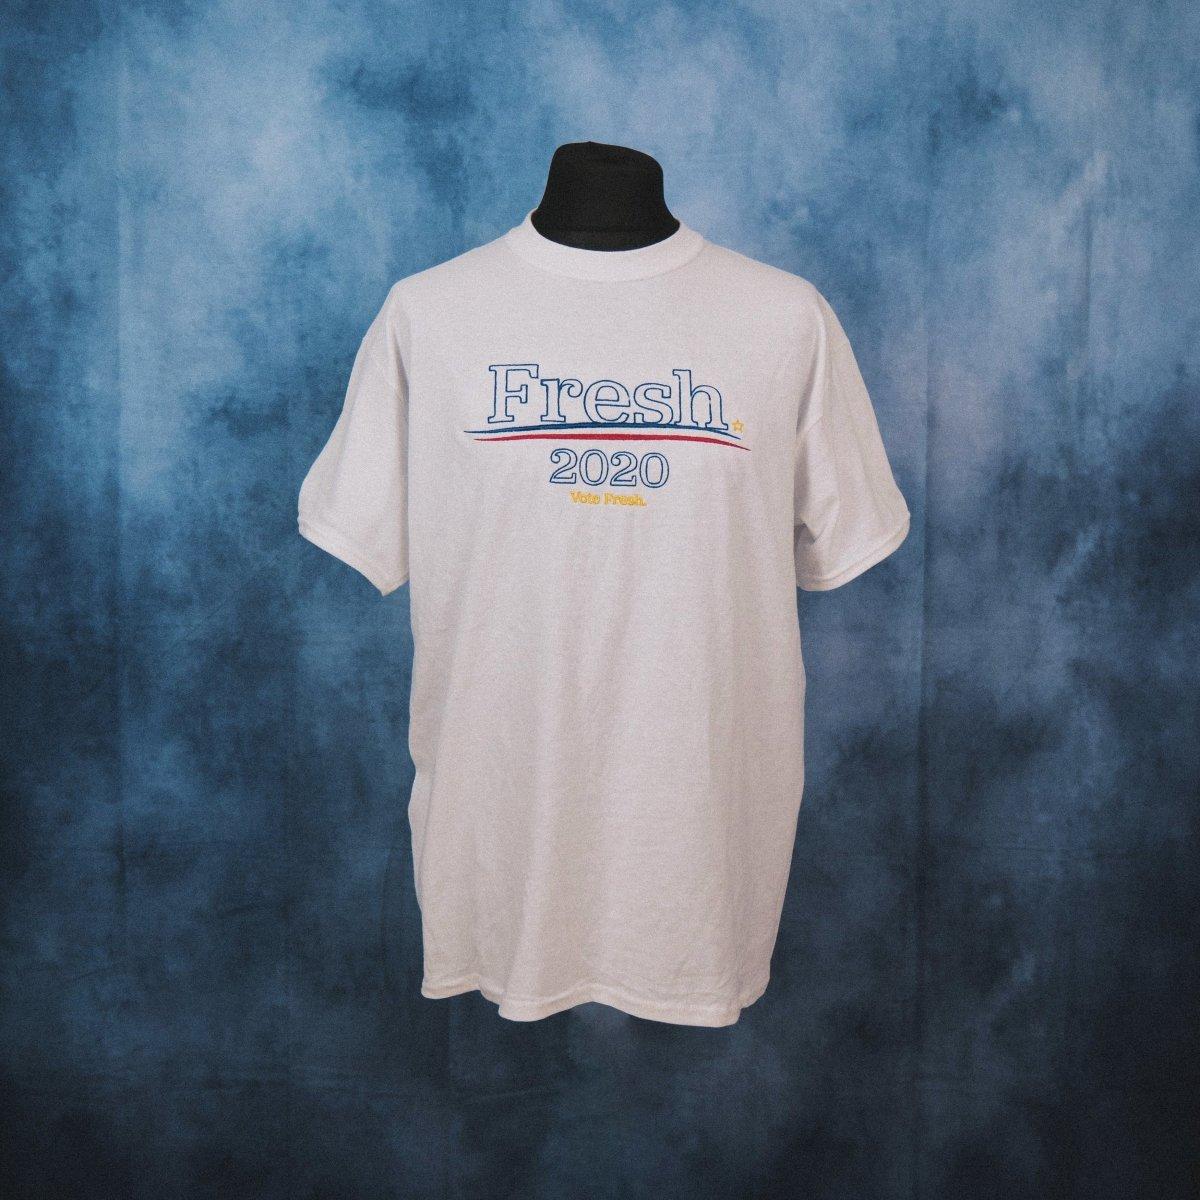 Fresh 2020 Unisex Embroidered T-Shirt